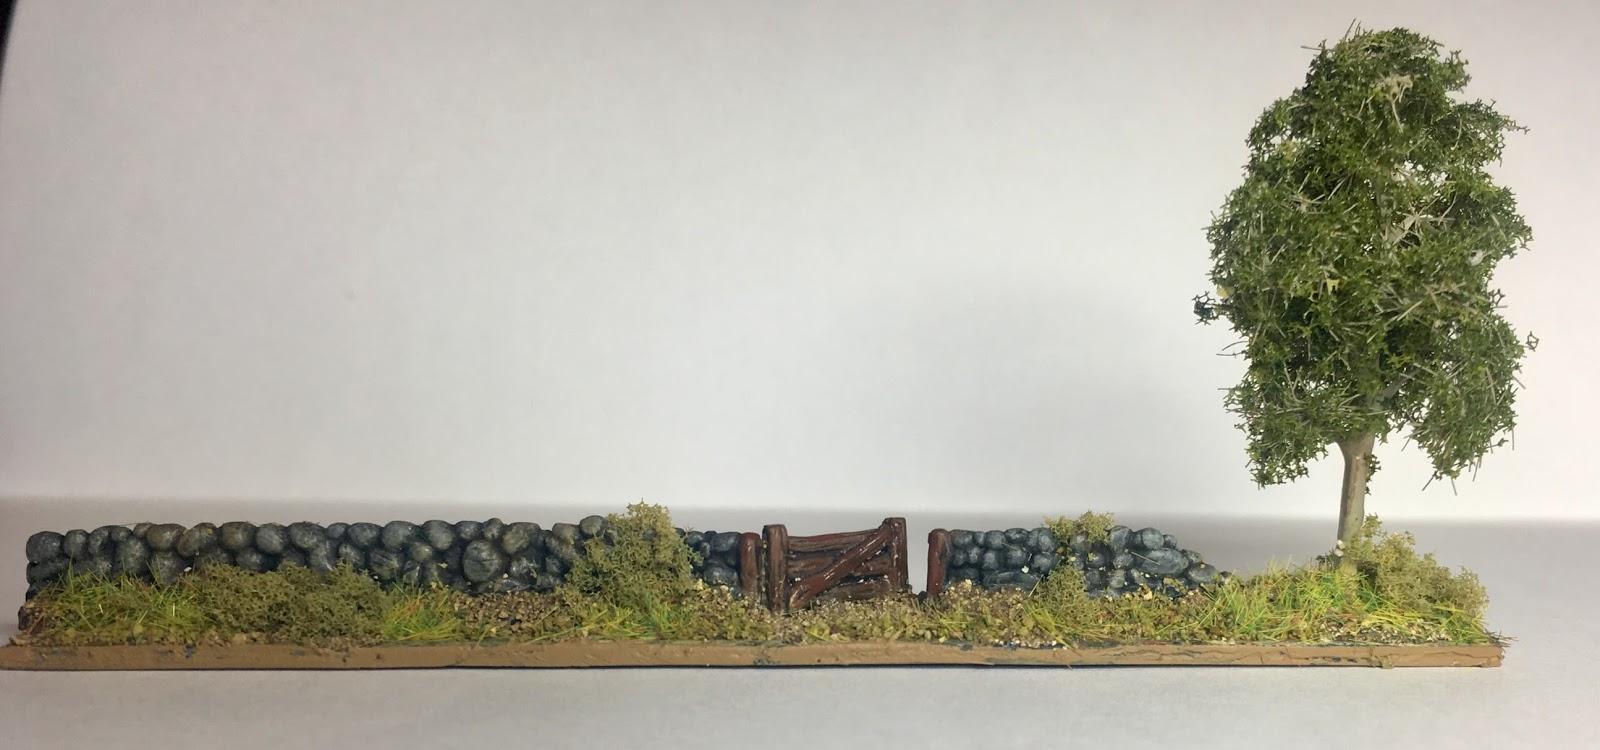 6mm rough stone walls